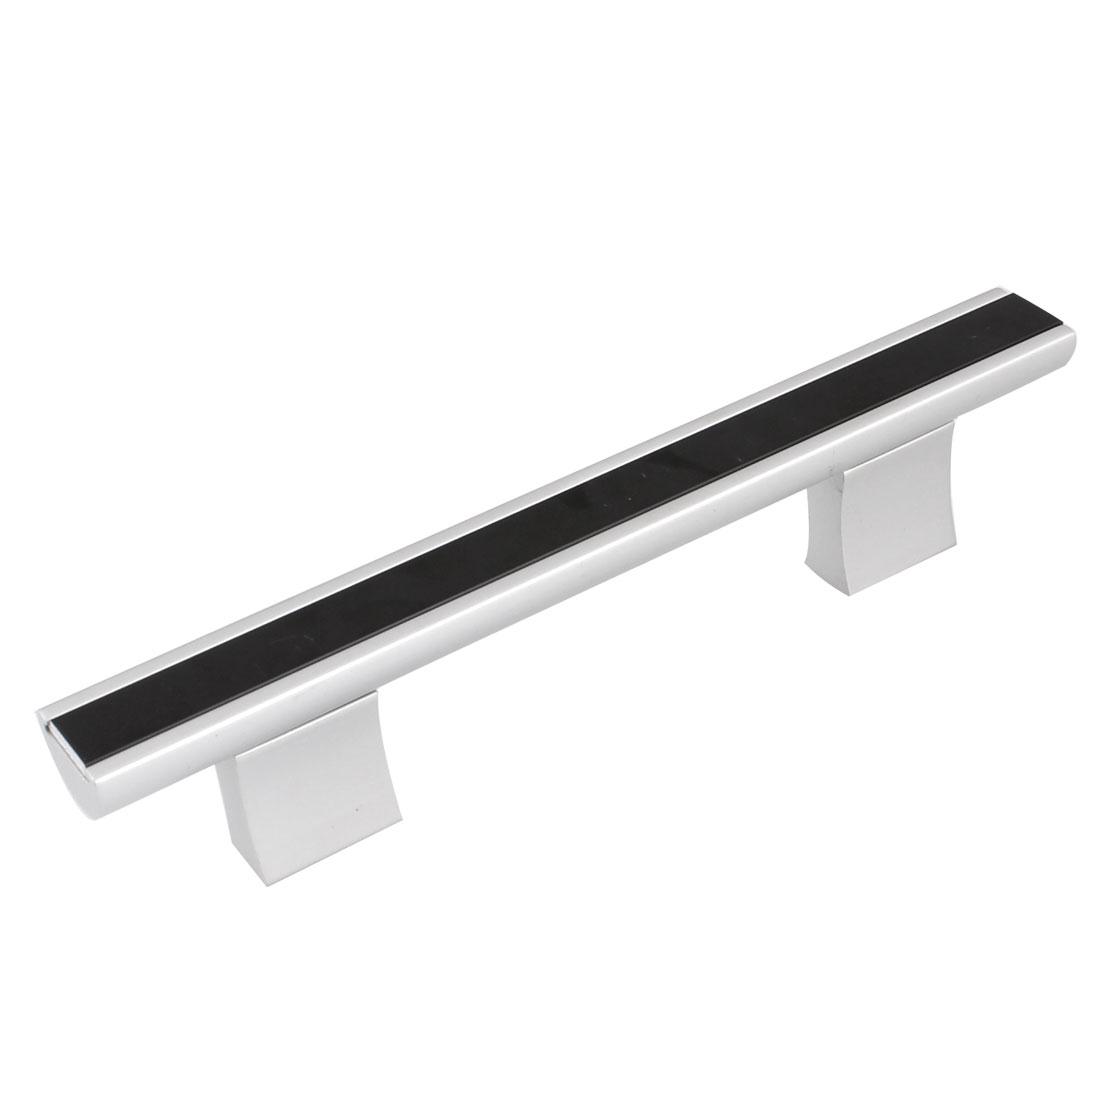 "Hardware Bar Shaped Cabinet Aluminum Pull Handle 5.8"" Long"